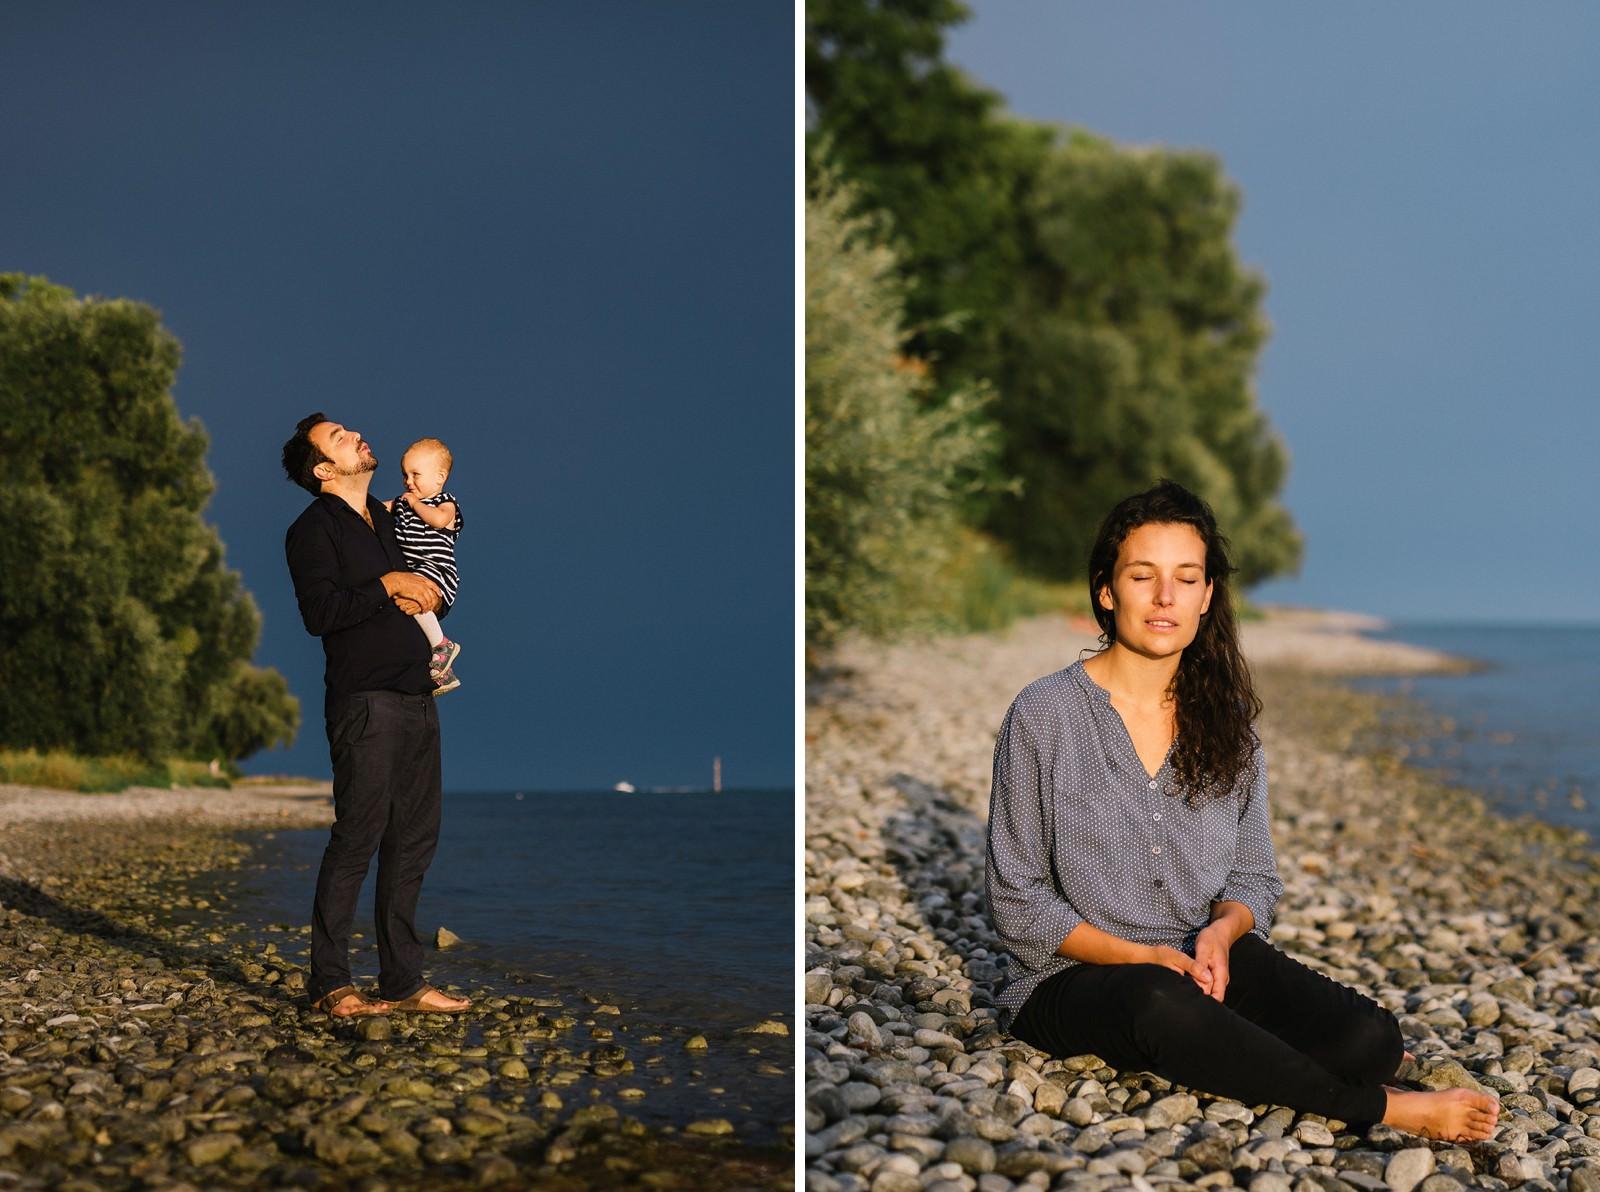 Fotograf Konstanz - Familienbilder Familien Musiker Baby Paar Shooting Konstanz EFP 15 - Family-Shooting at Lake Constance  - 13 -